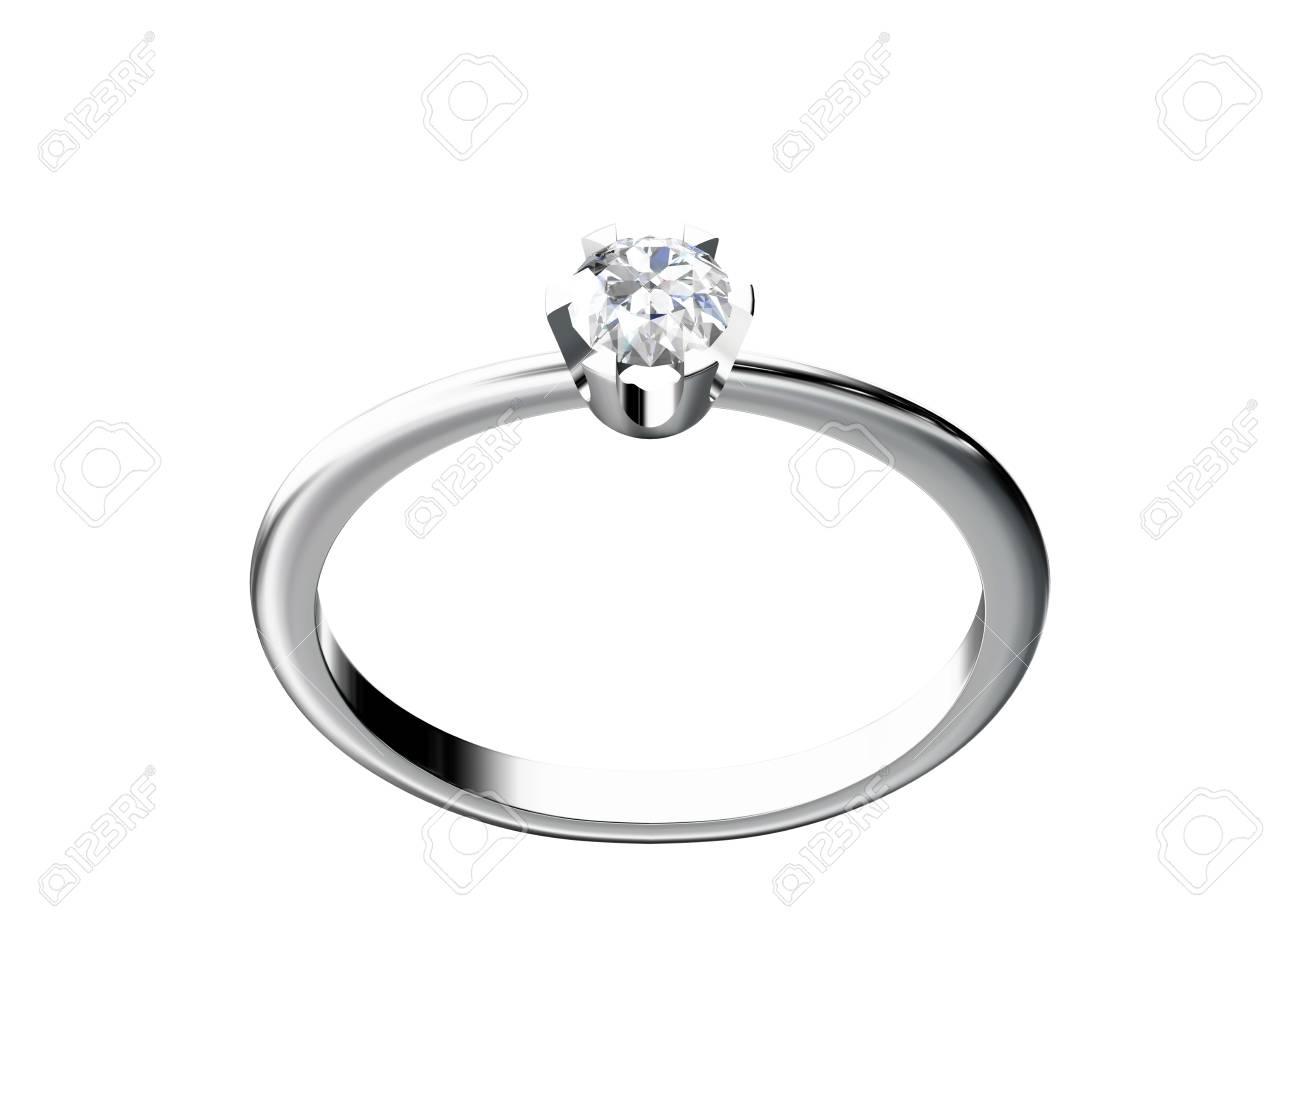 wedding rings Stock Photo - 10356637